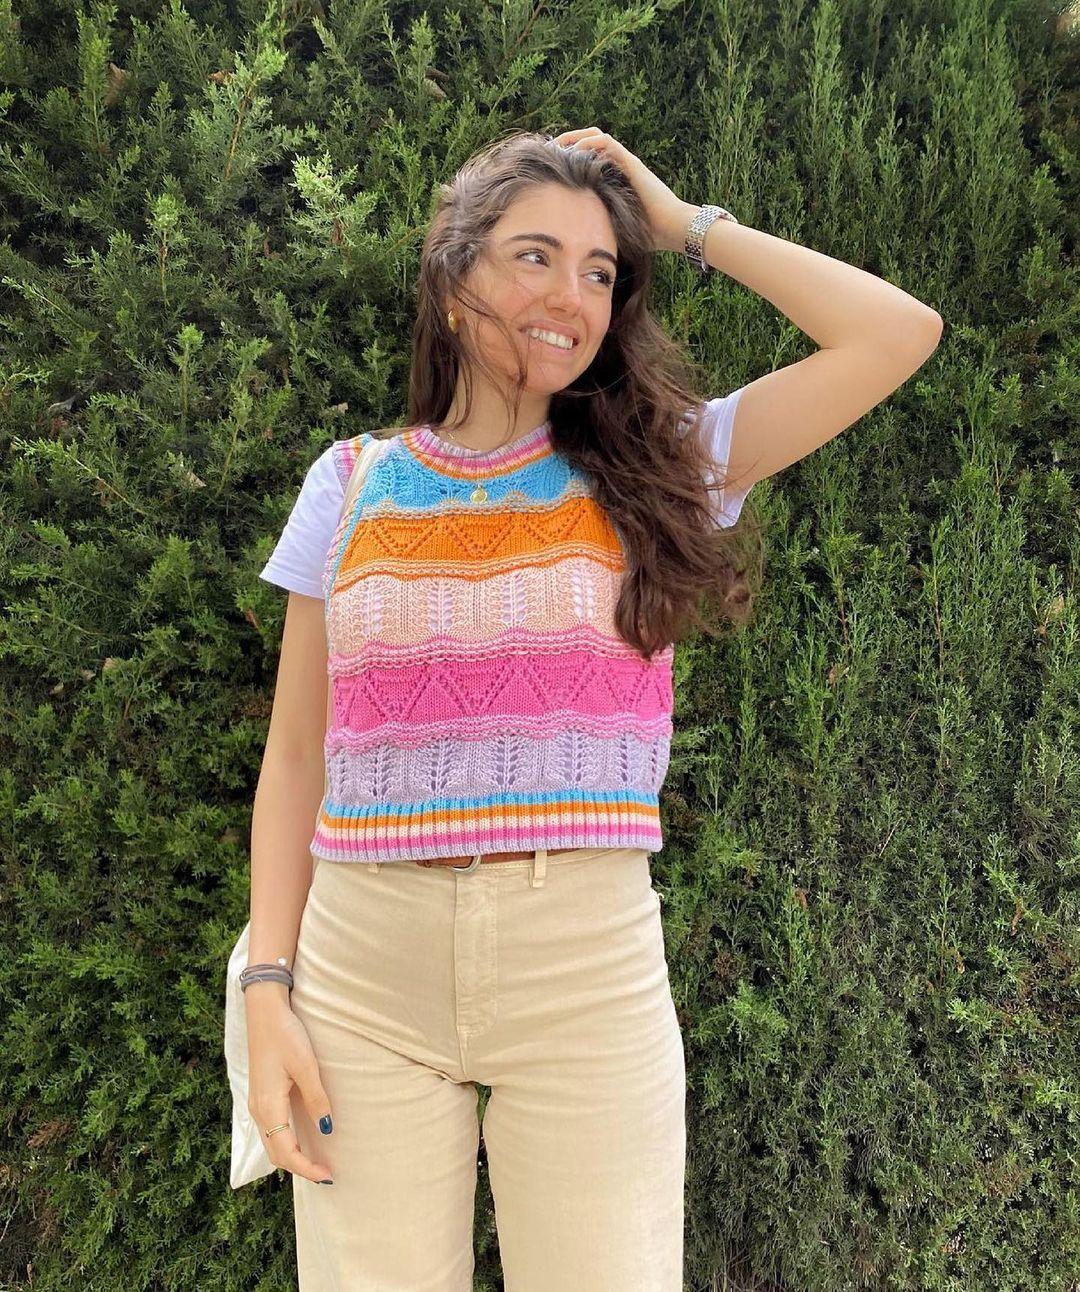 crocheted and knit top de Zara sur zara.outfits